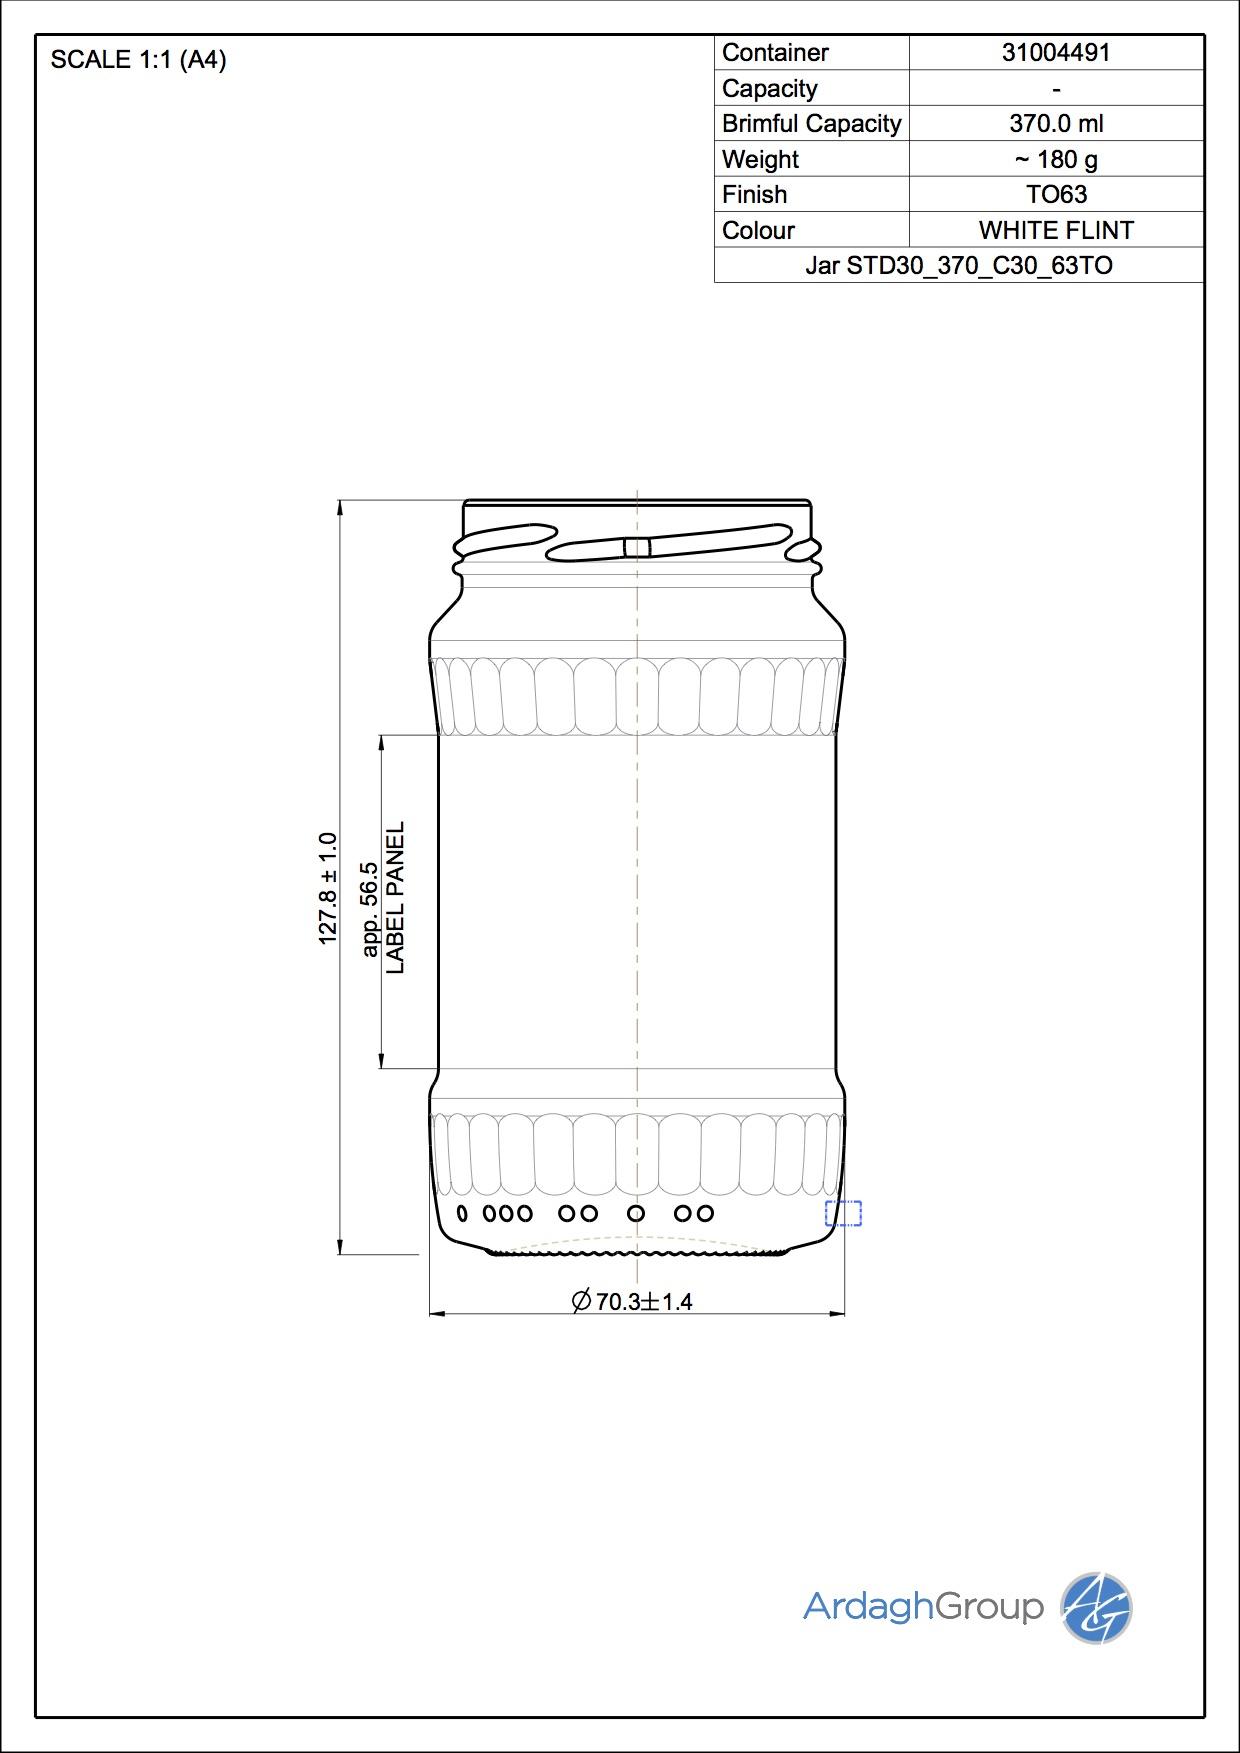 Jar STD30 370 C30 63TO